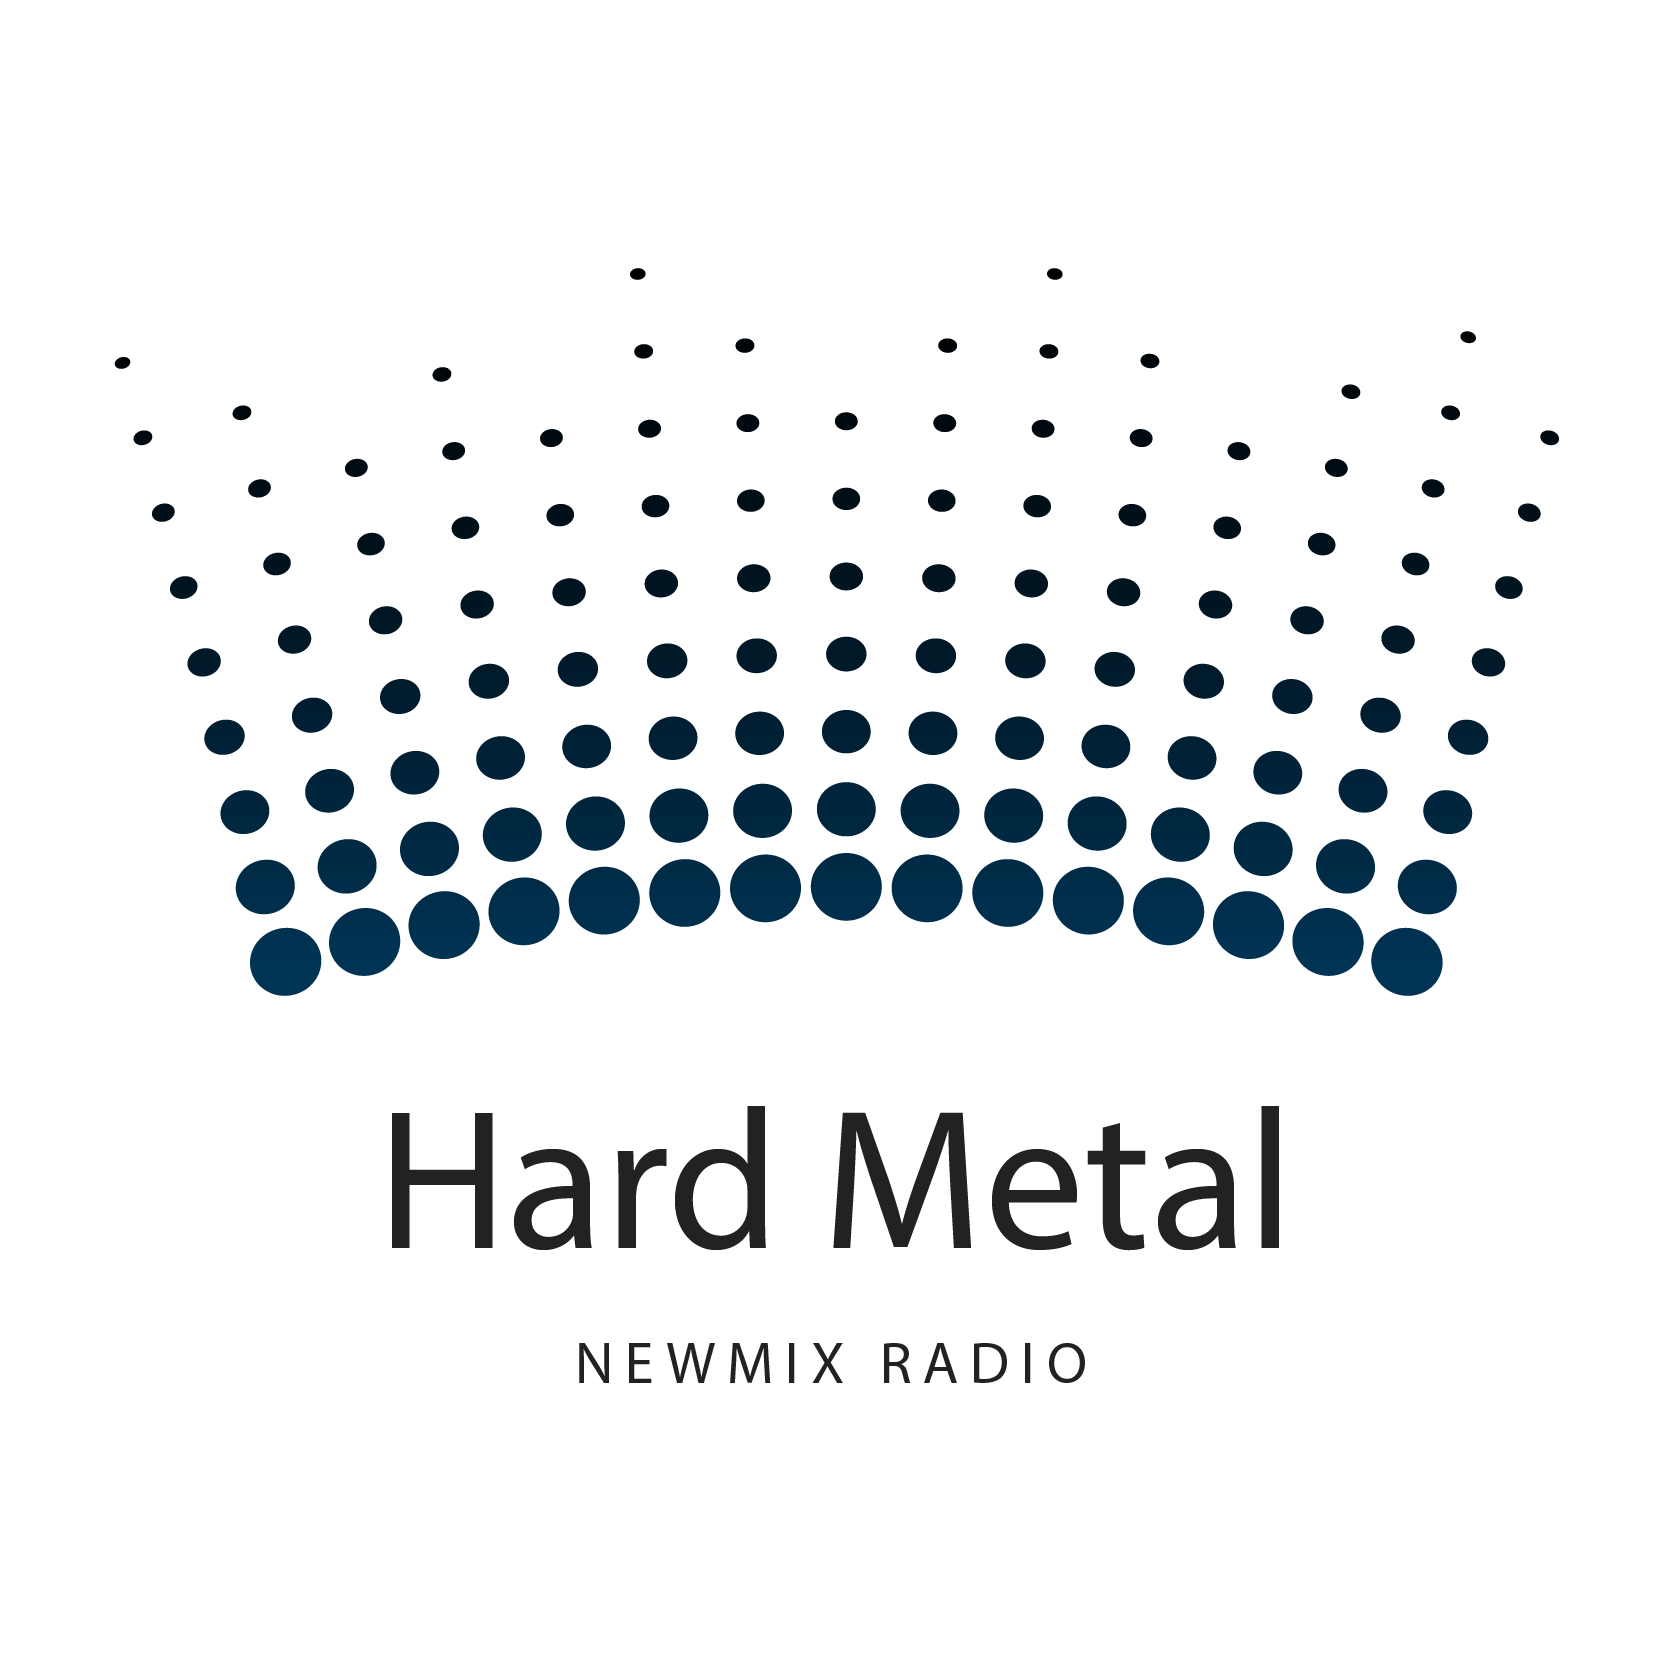 A_A Hardrock & Metal